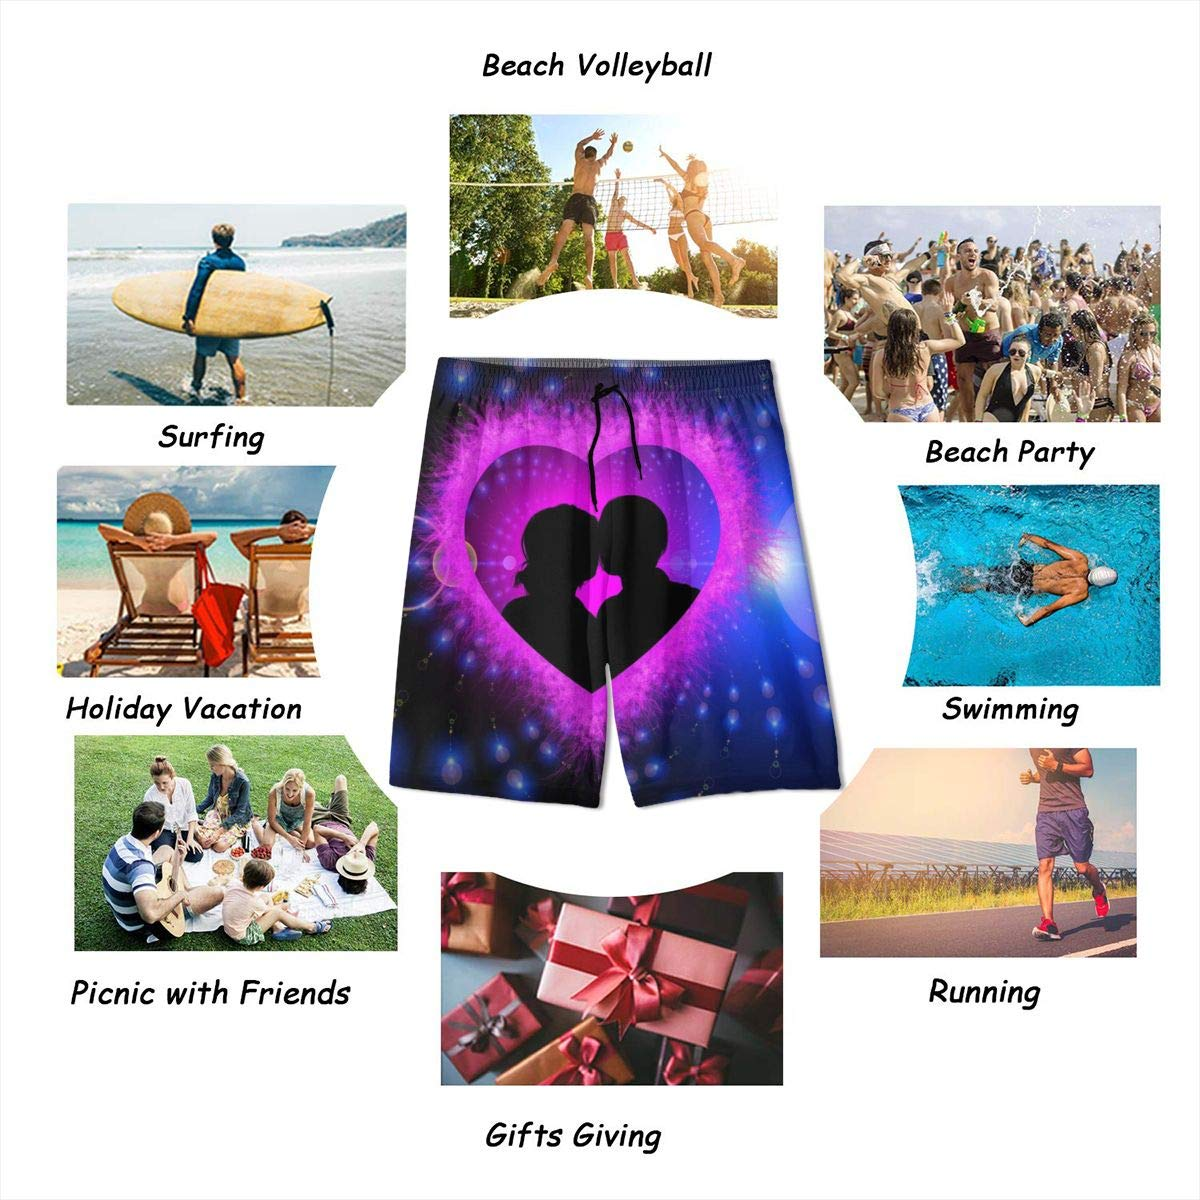 Rigg-pants Boys Comfortable Hawaii Surfing Leisure Cool Beach Shorts Swim Trunks Board Shorts